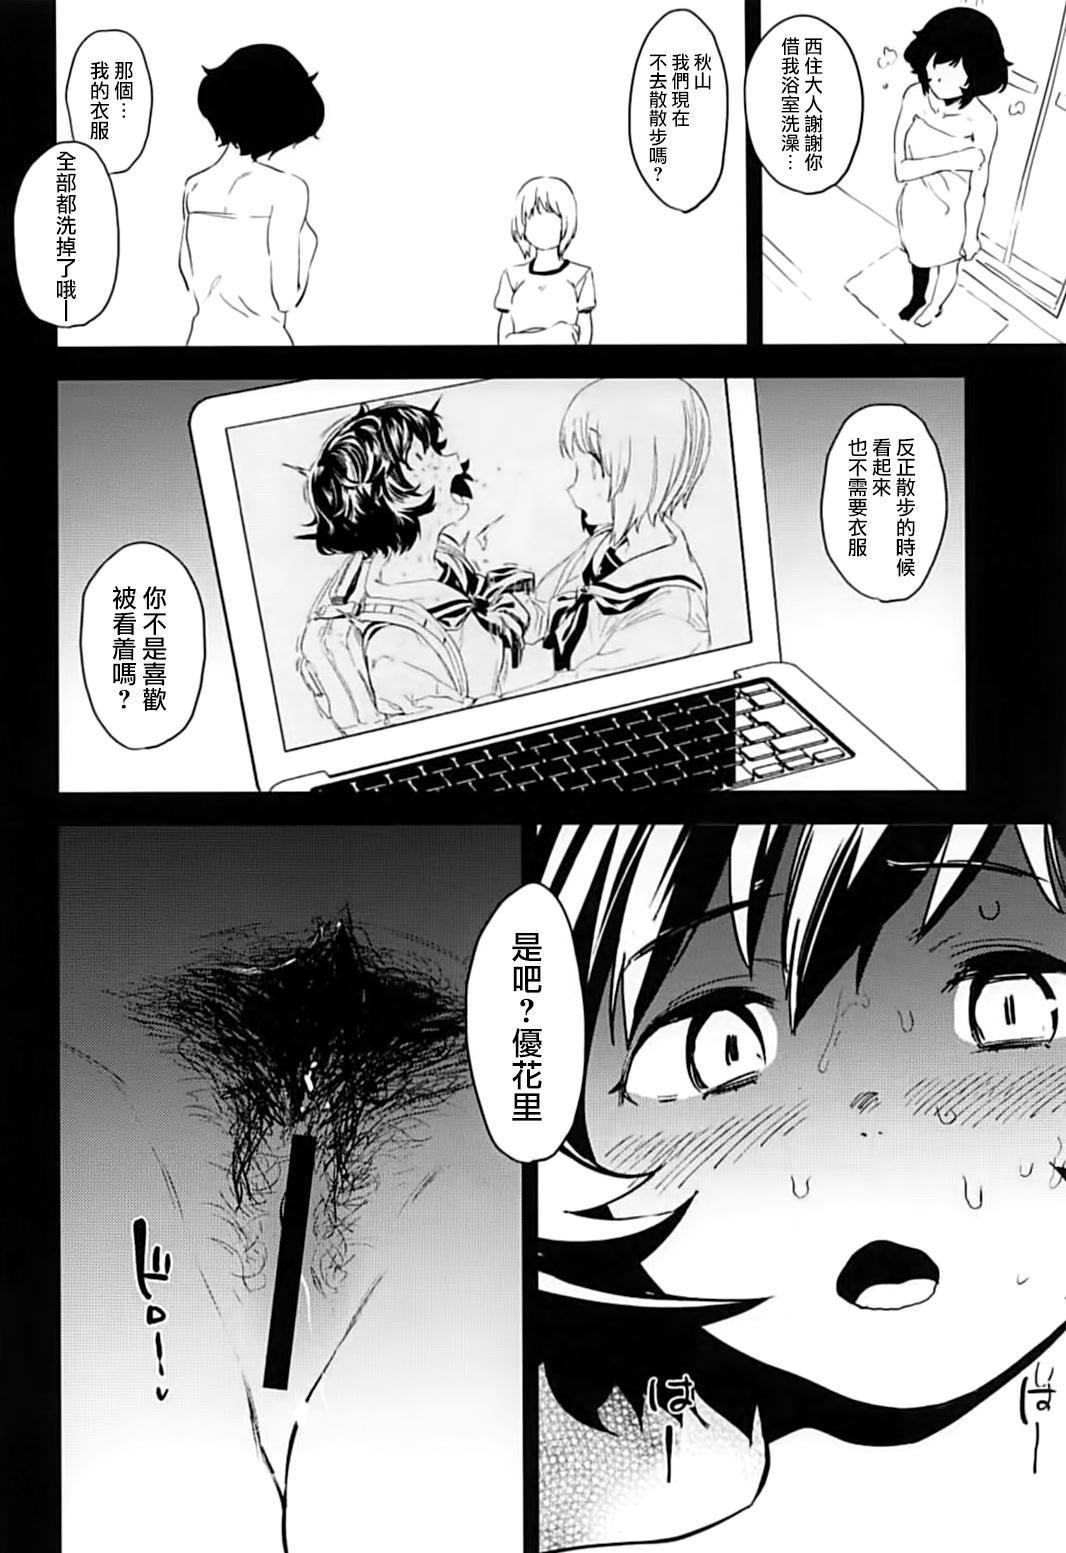 (Panzer Vor! 13) [Camrism (Kito Sakeru)] Private Akiyama 2 - Nishizumi-san to Issho (Girls und Panzer) [Chinese] [沒有漢化] 23